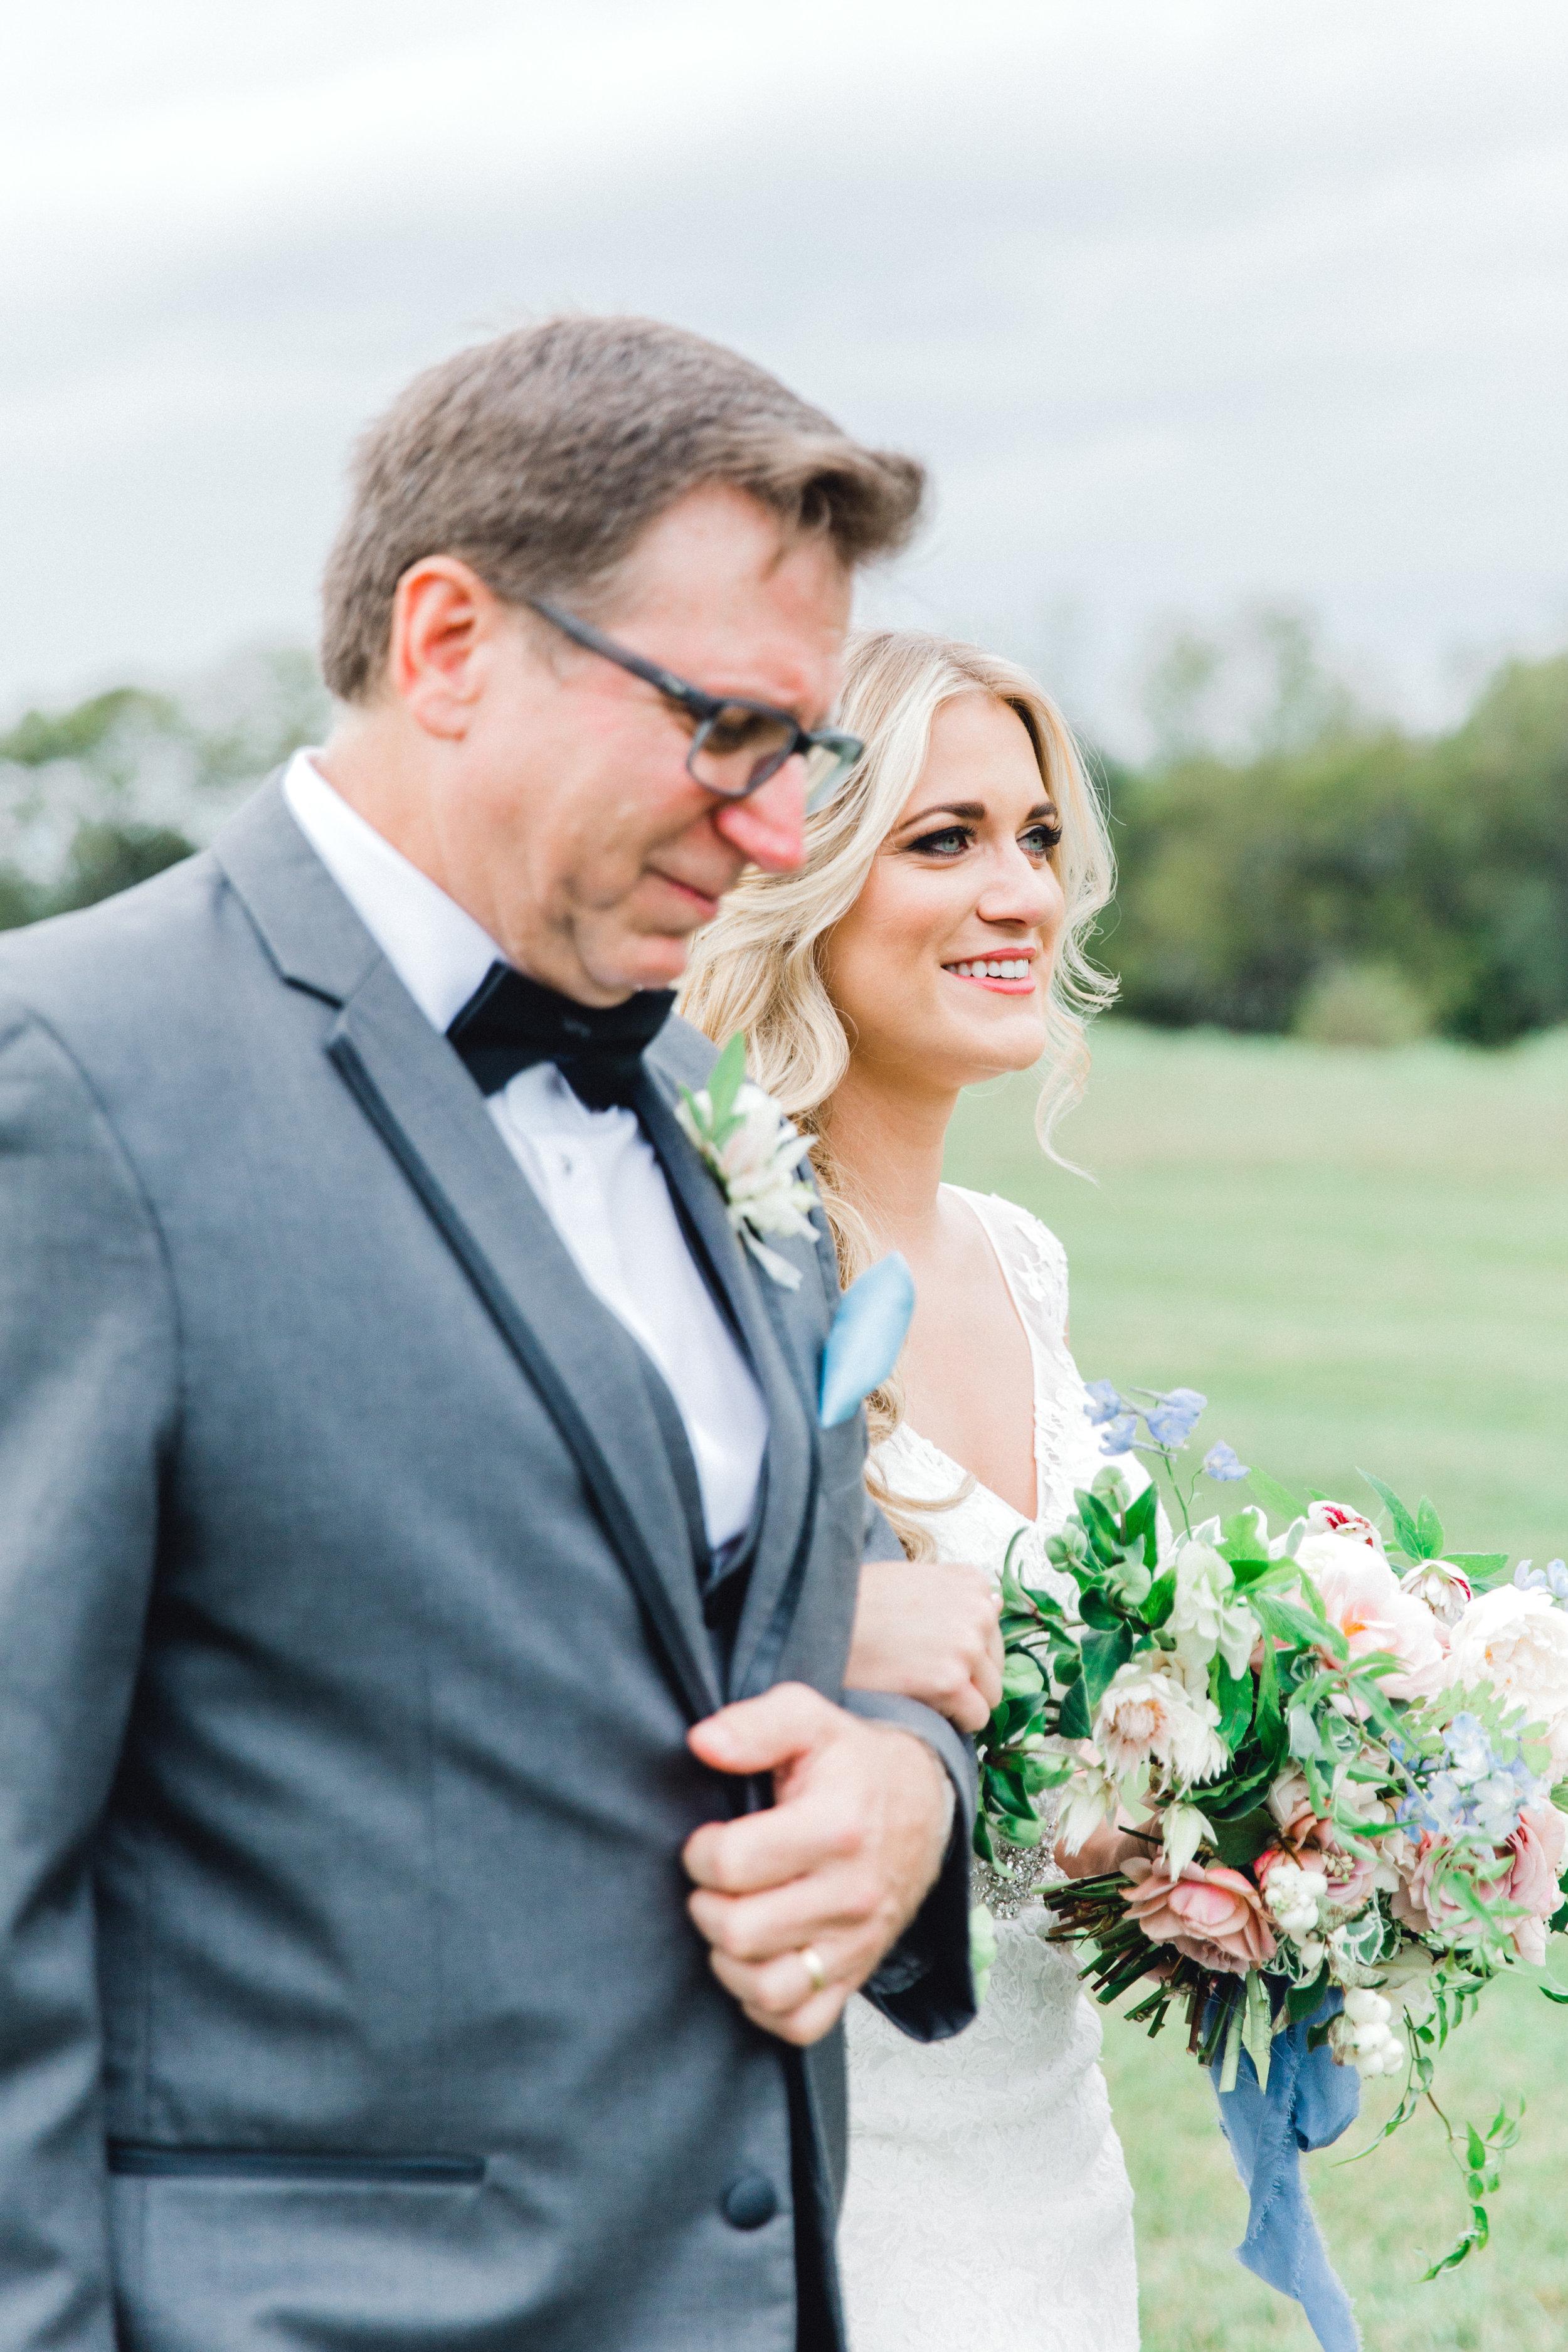 Paige-Mercer-Photography-Florida-Wedding-Photographer-Alyssa&Drew-43.jpg